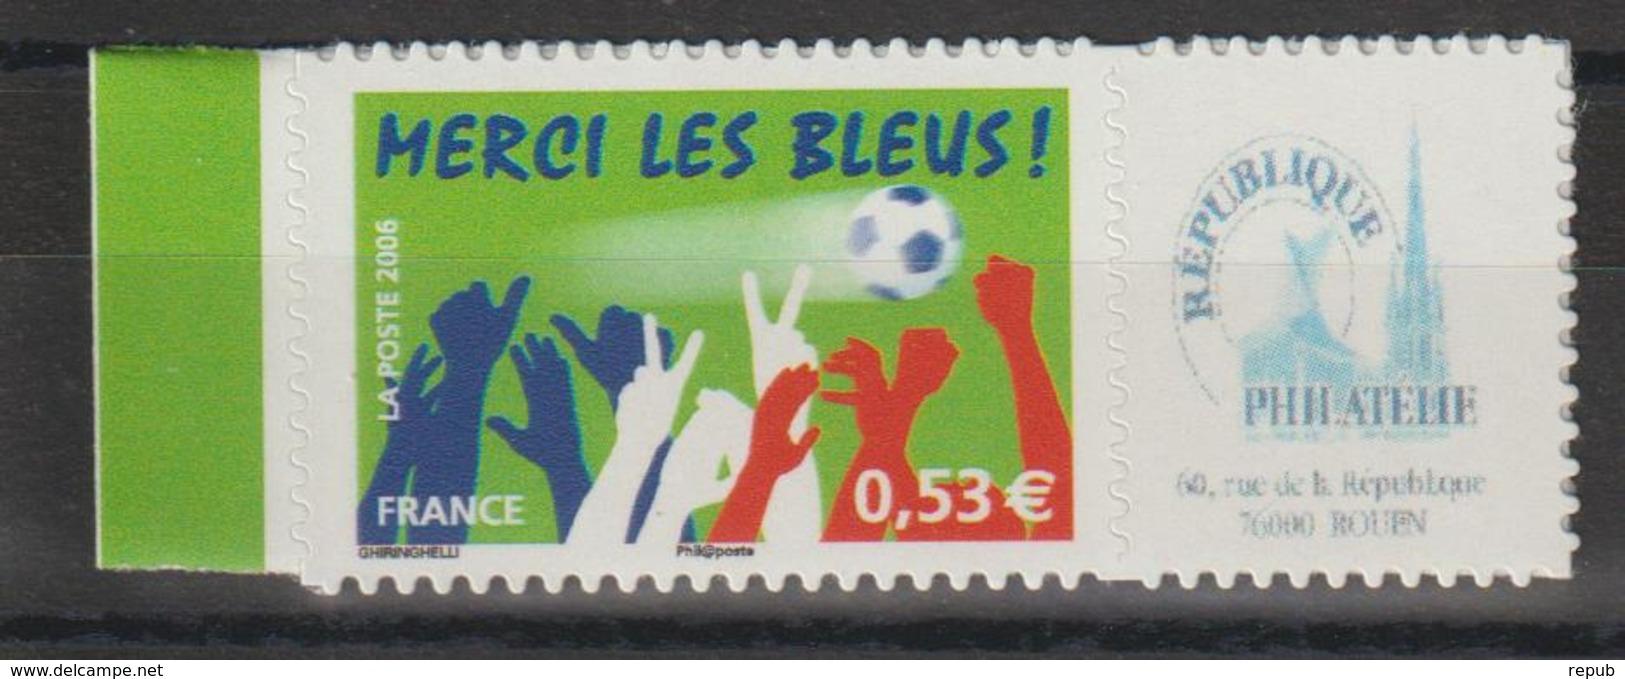 France Personnalisés 2006 Merci Les Bleus 3936B ** MNH - Francia